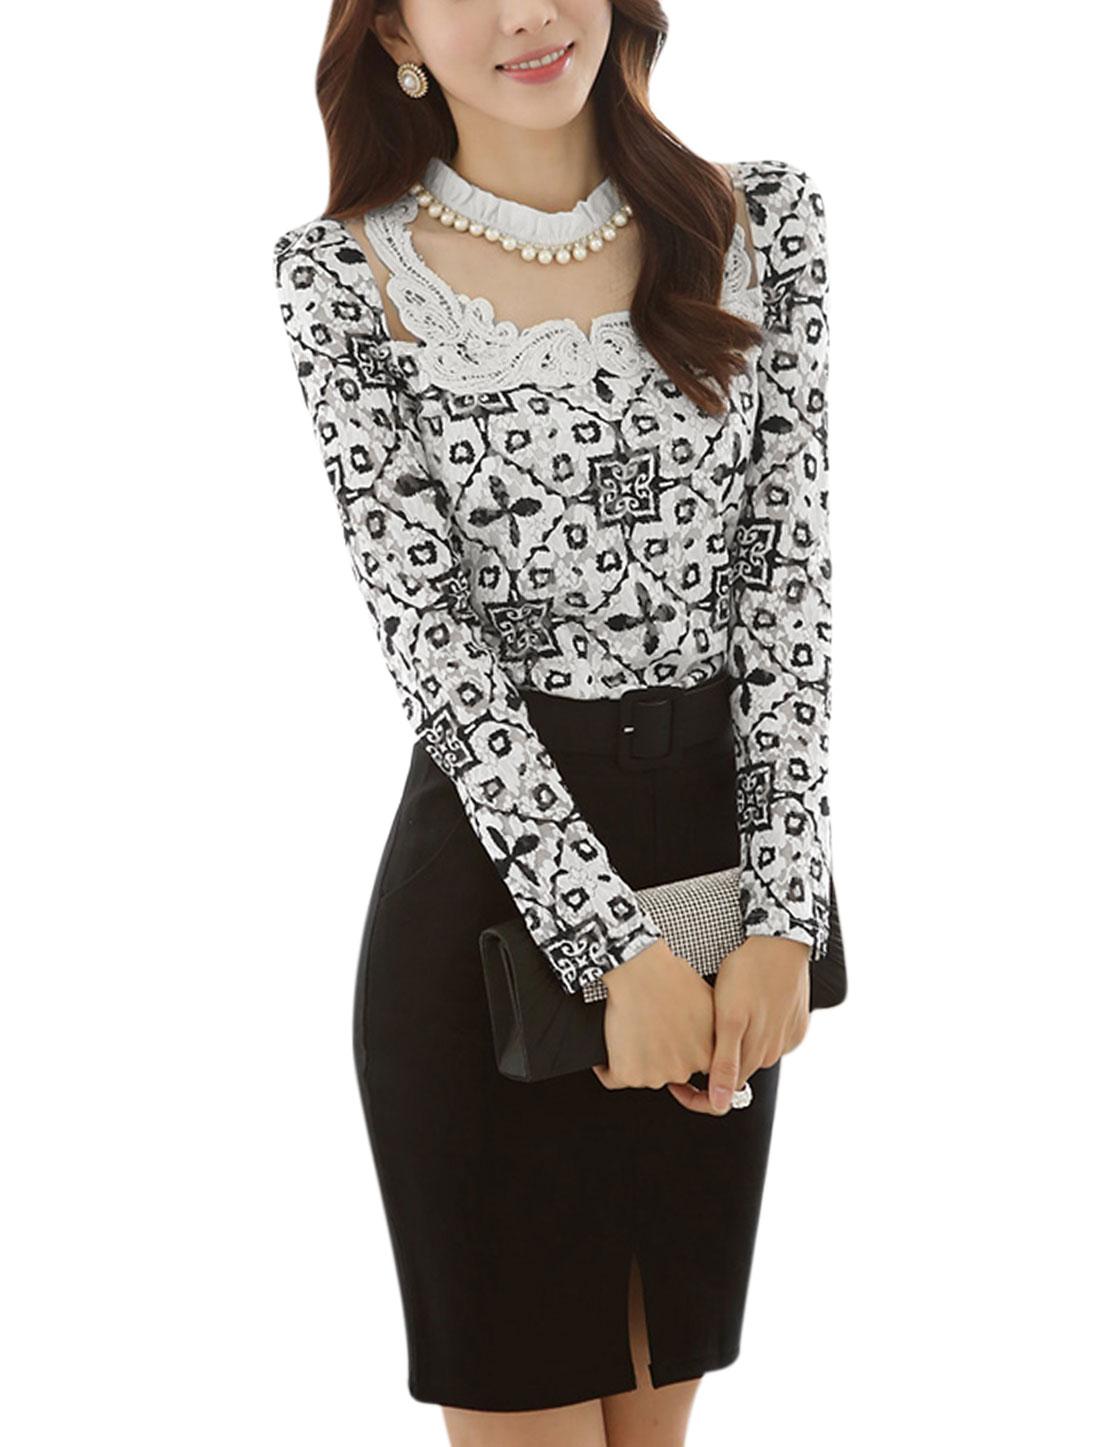 Lady Mesh Panel York Novelty Print Fake Pearl Decor Top Black White M